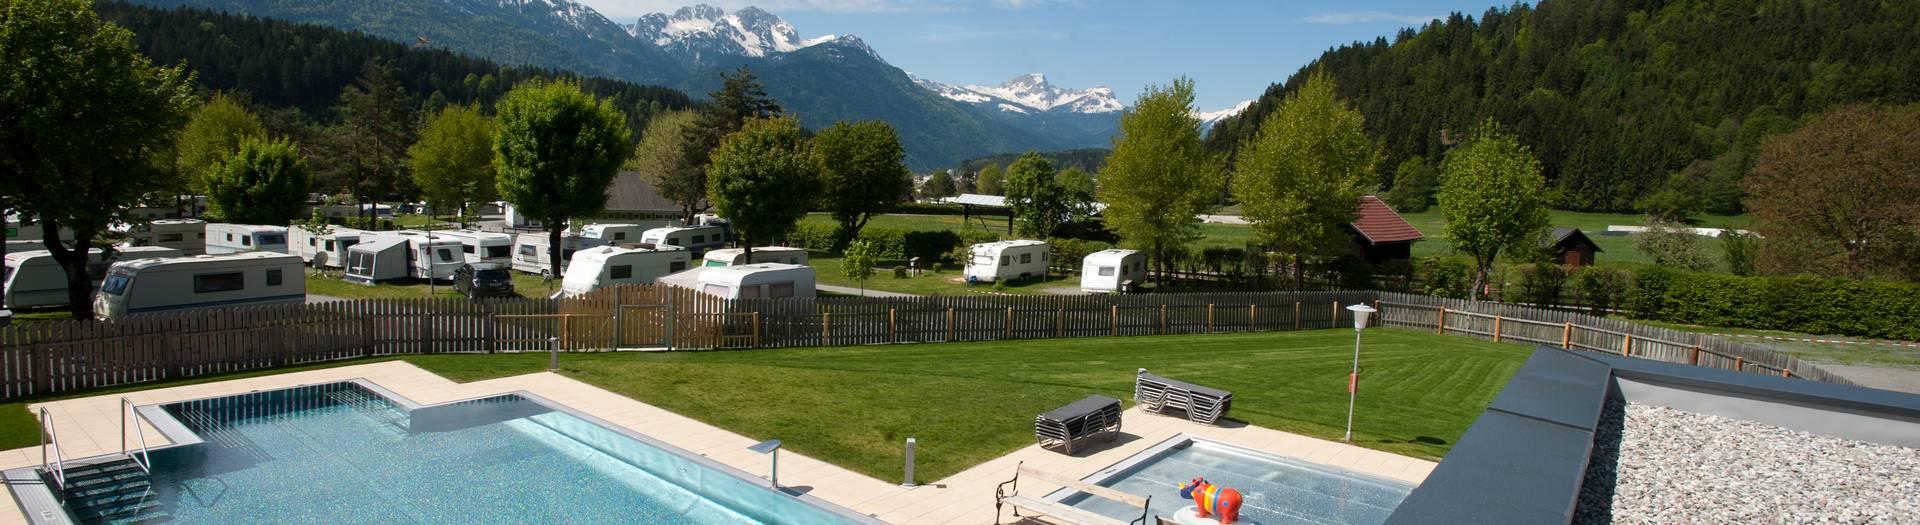 Camping, Mobile Homes, Camping Schluga Alpin Spa